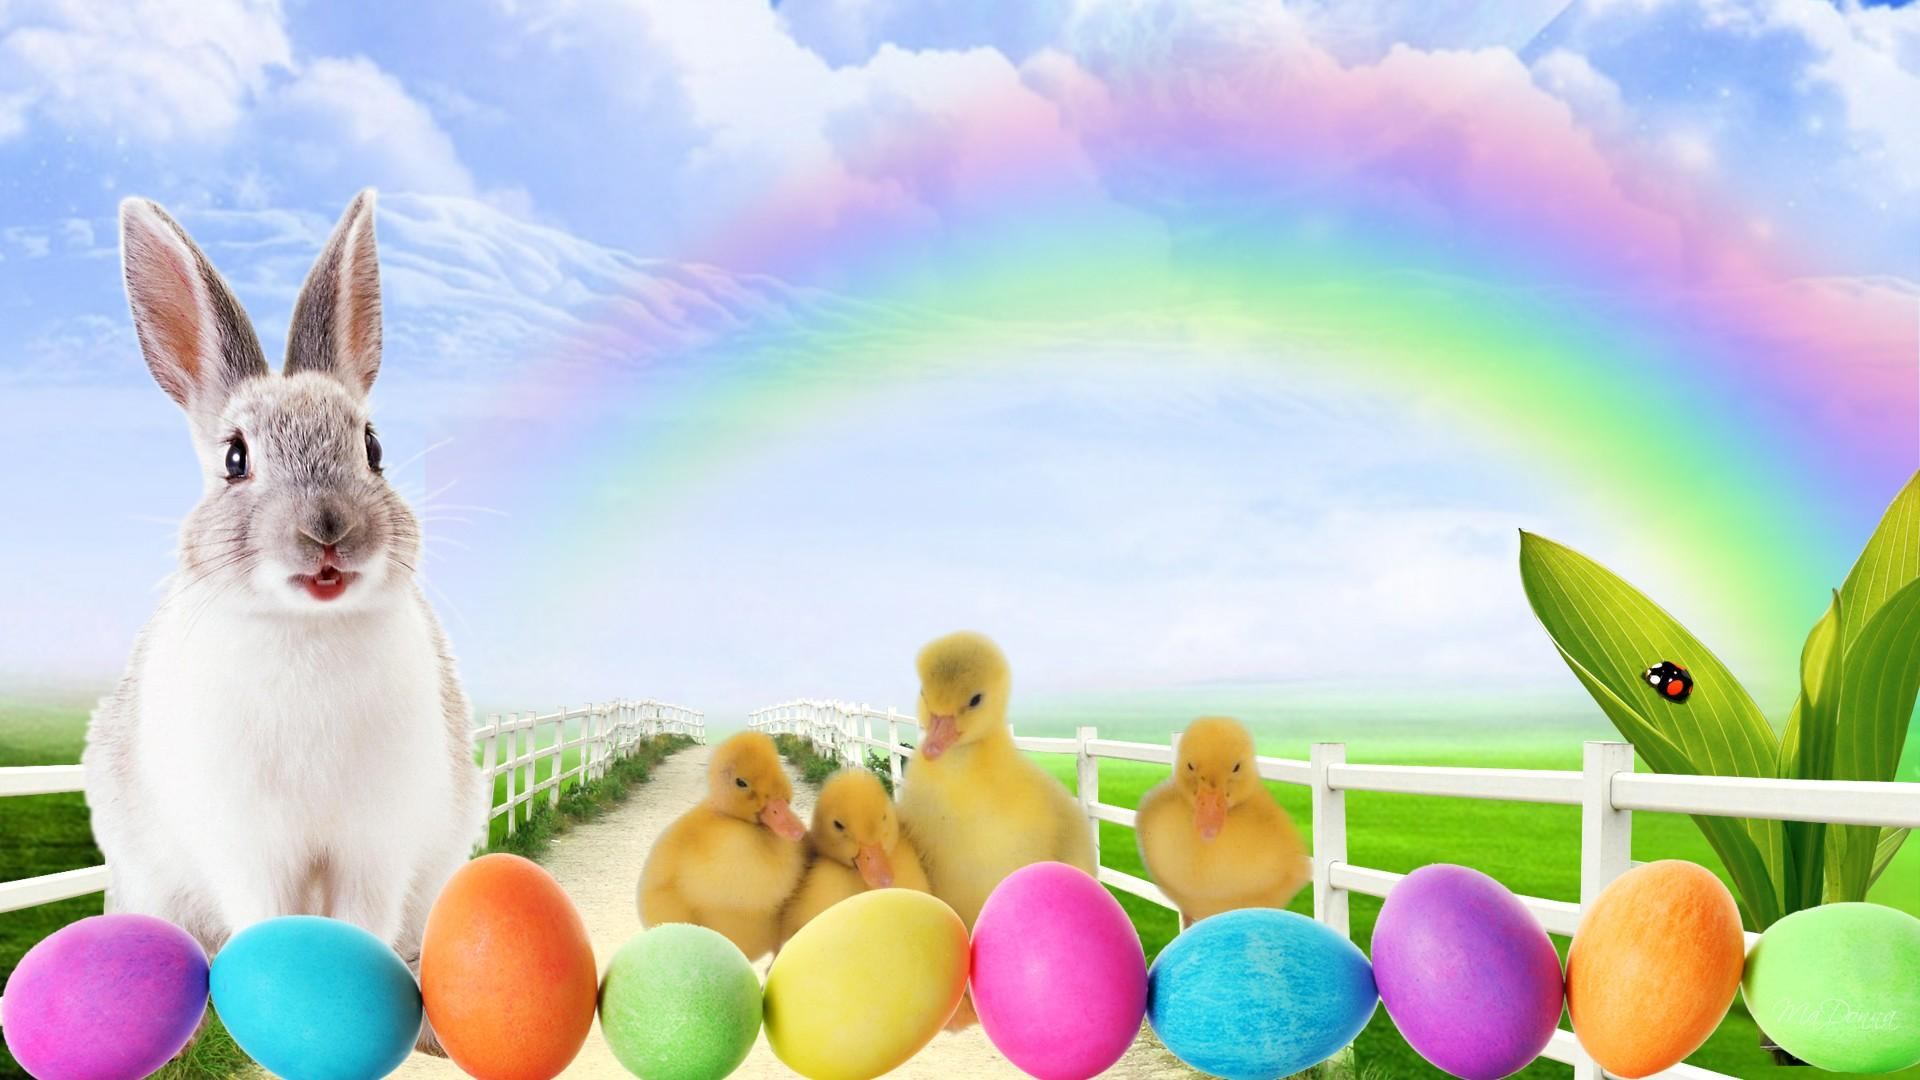 Wonderwild spring 2014 easter egg hunt for Call the easter bunny phone number